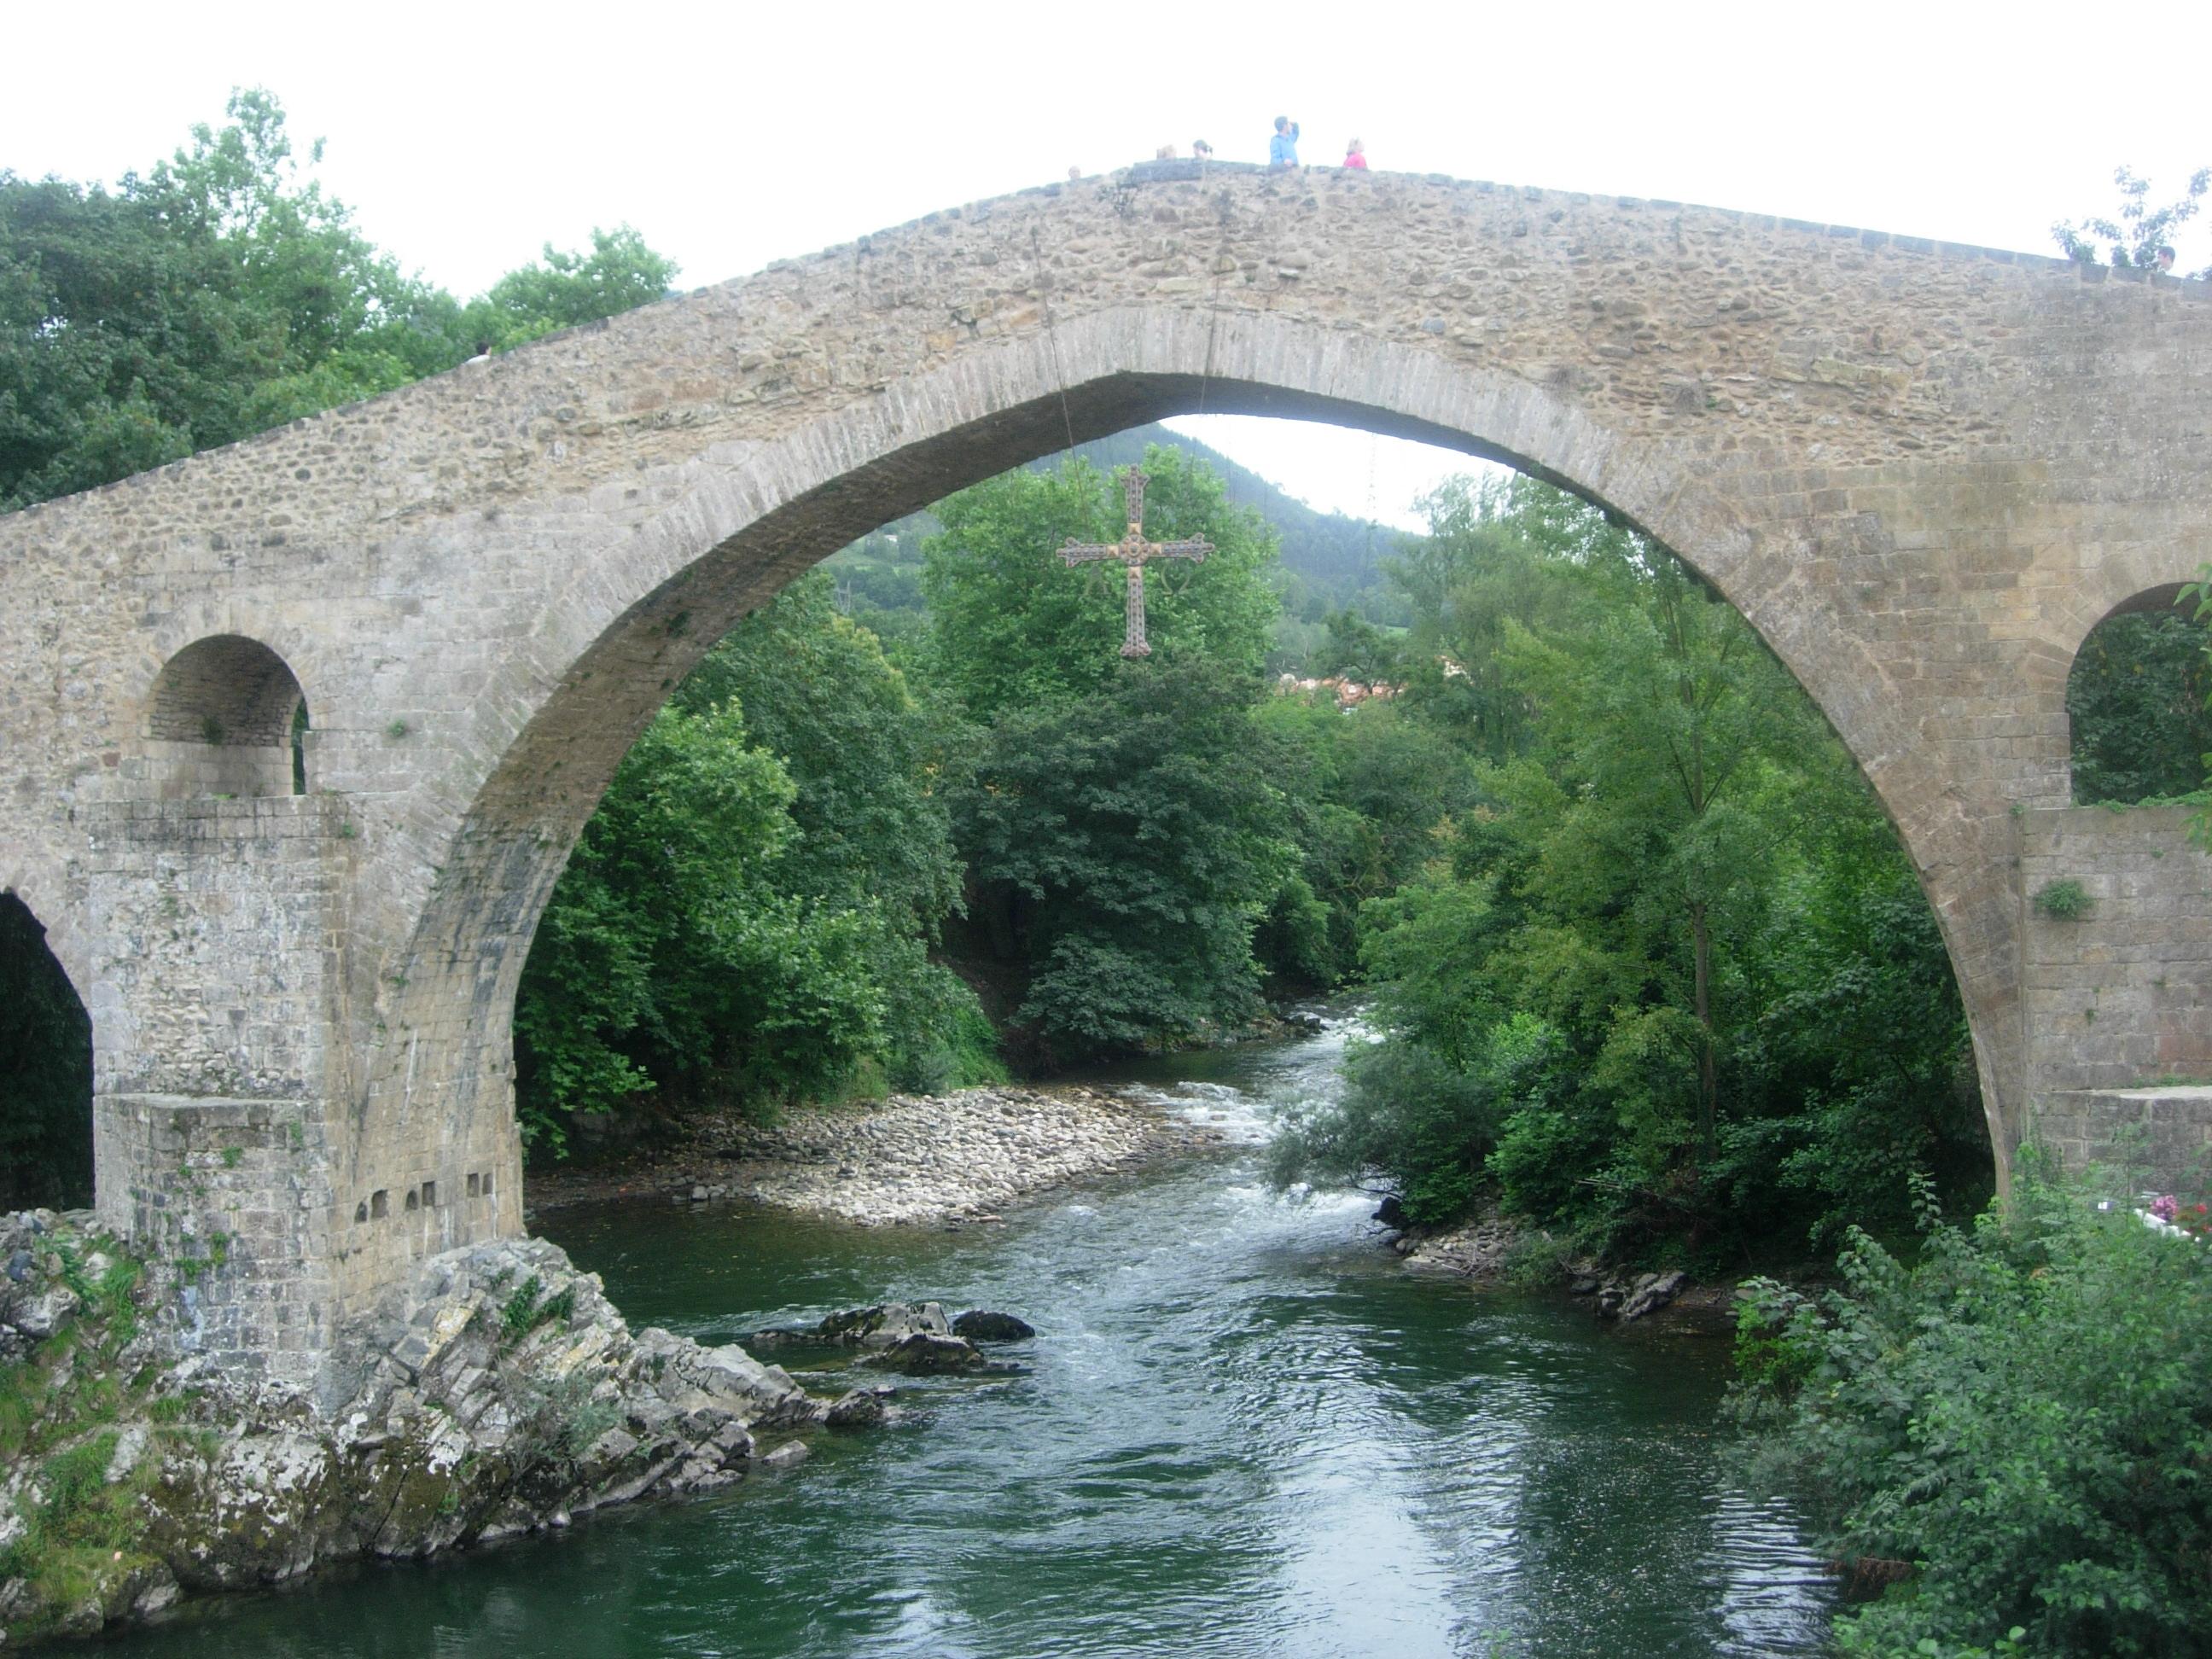 File:Puente Romano de Cangas de Onil.JPG - Wikimedia Commons